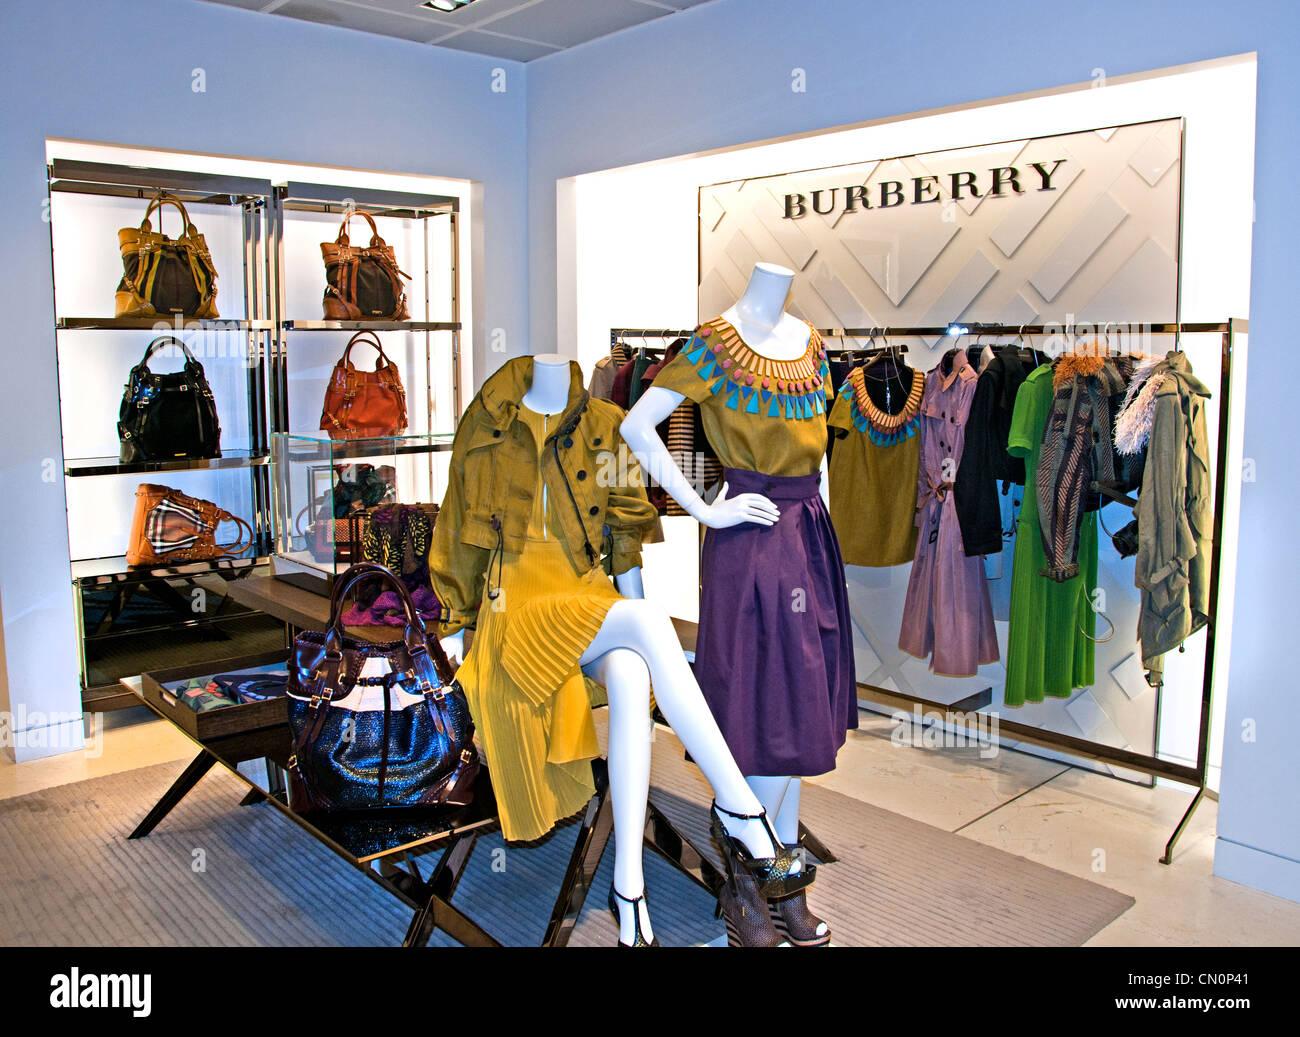 burberry le bon march paris france fashion department store stock photo 47345873 alamy. Black Bedroom Furniture Sets. Home Design Ideas